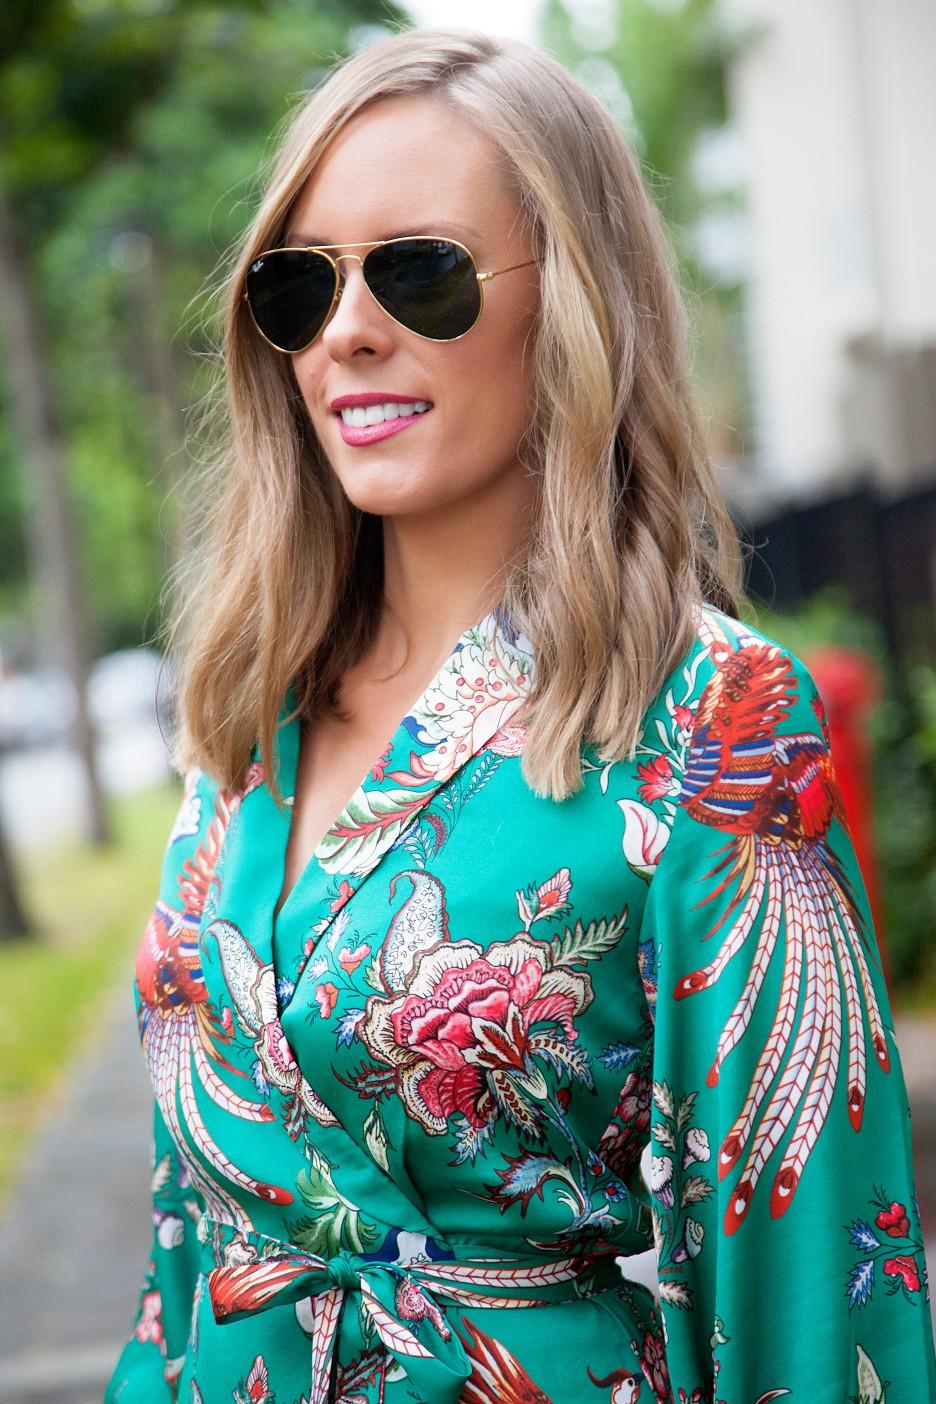 silk pajama print green emerald dress fashion blogger outfit ideas chanel flap handbag lauren slade style elixir 2